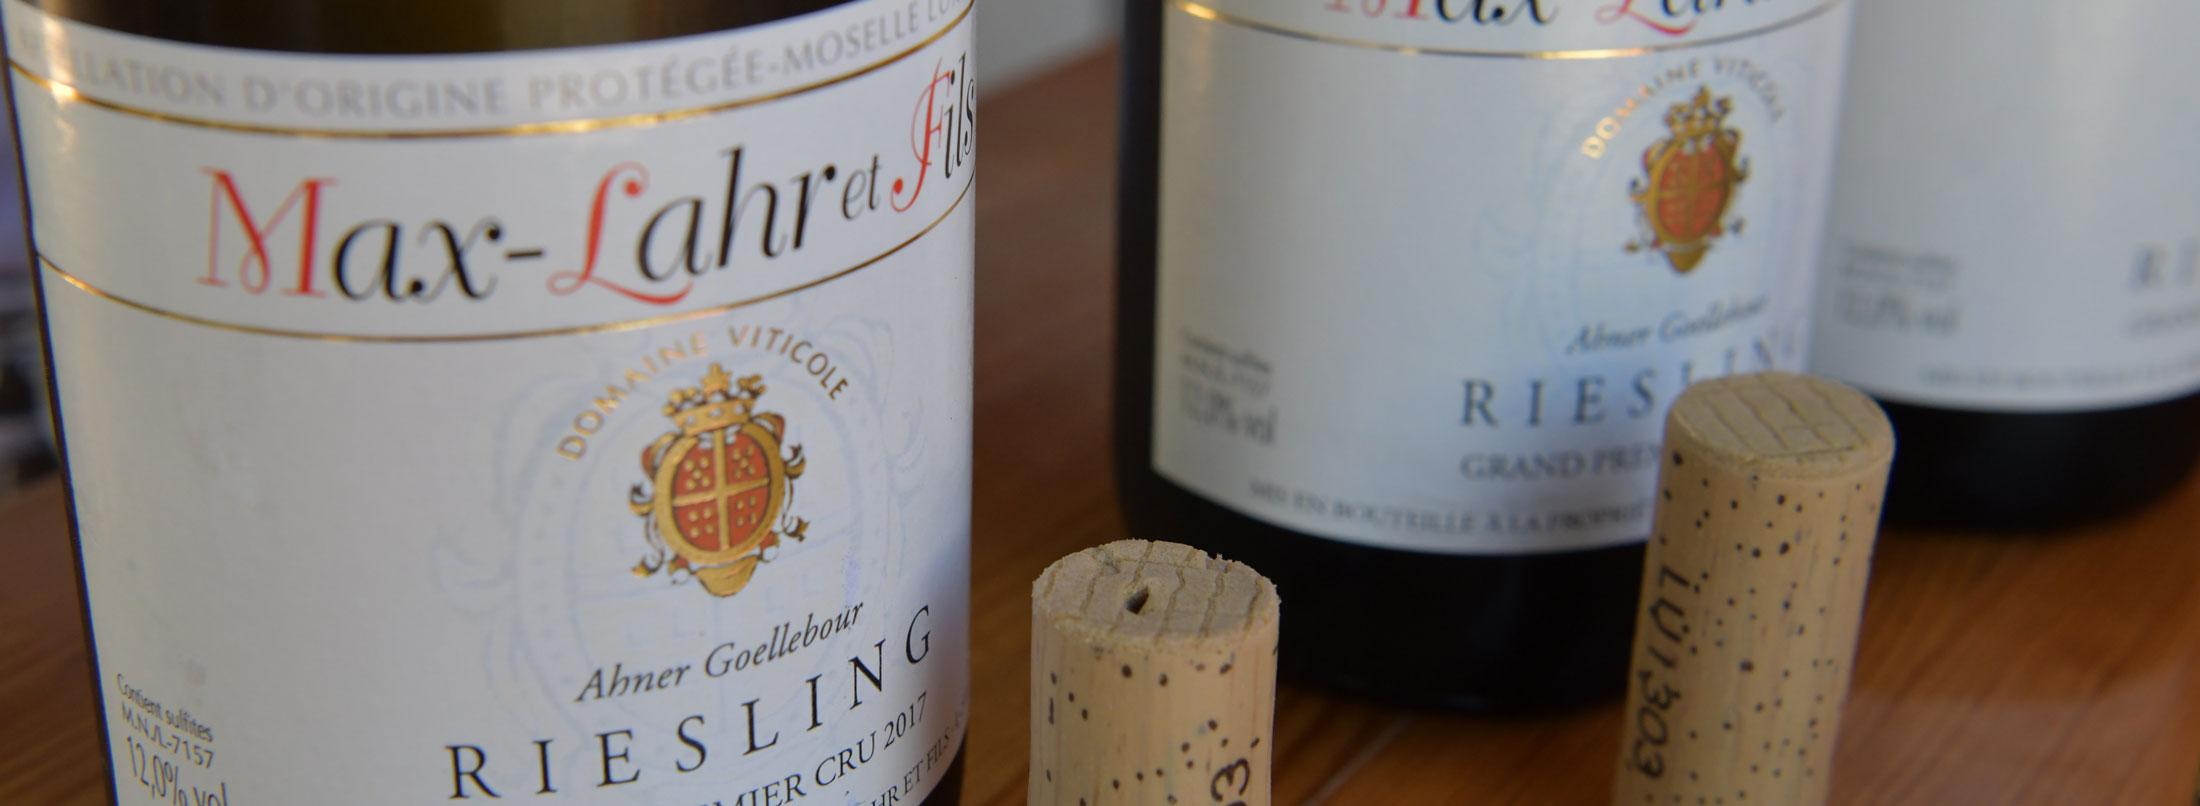 Weingut Max Lahr Ahn Riesling